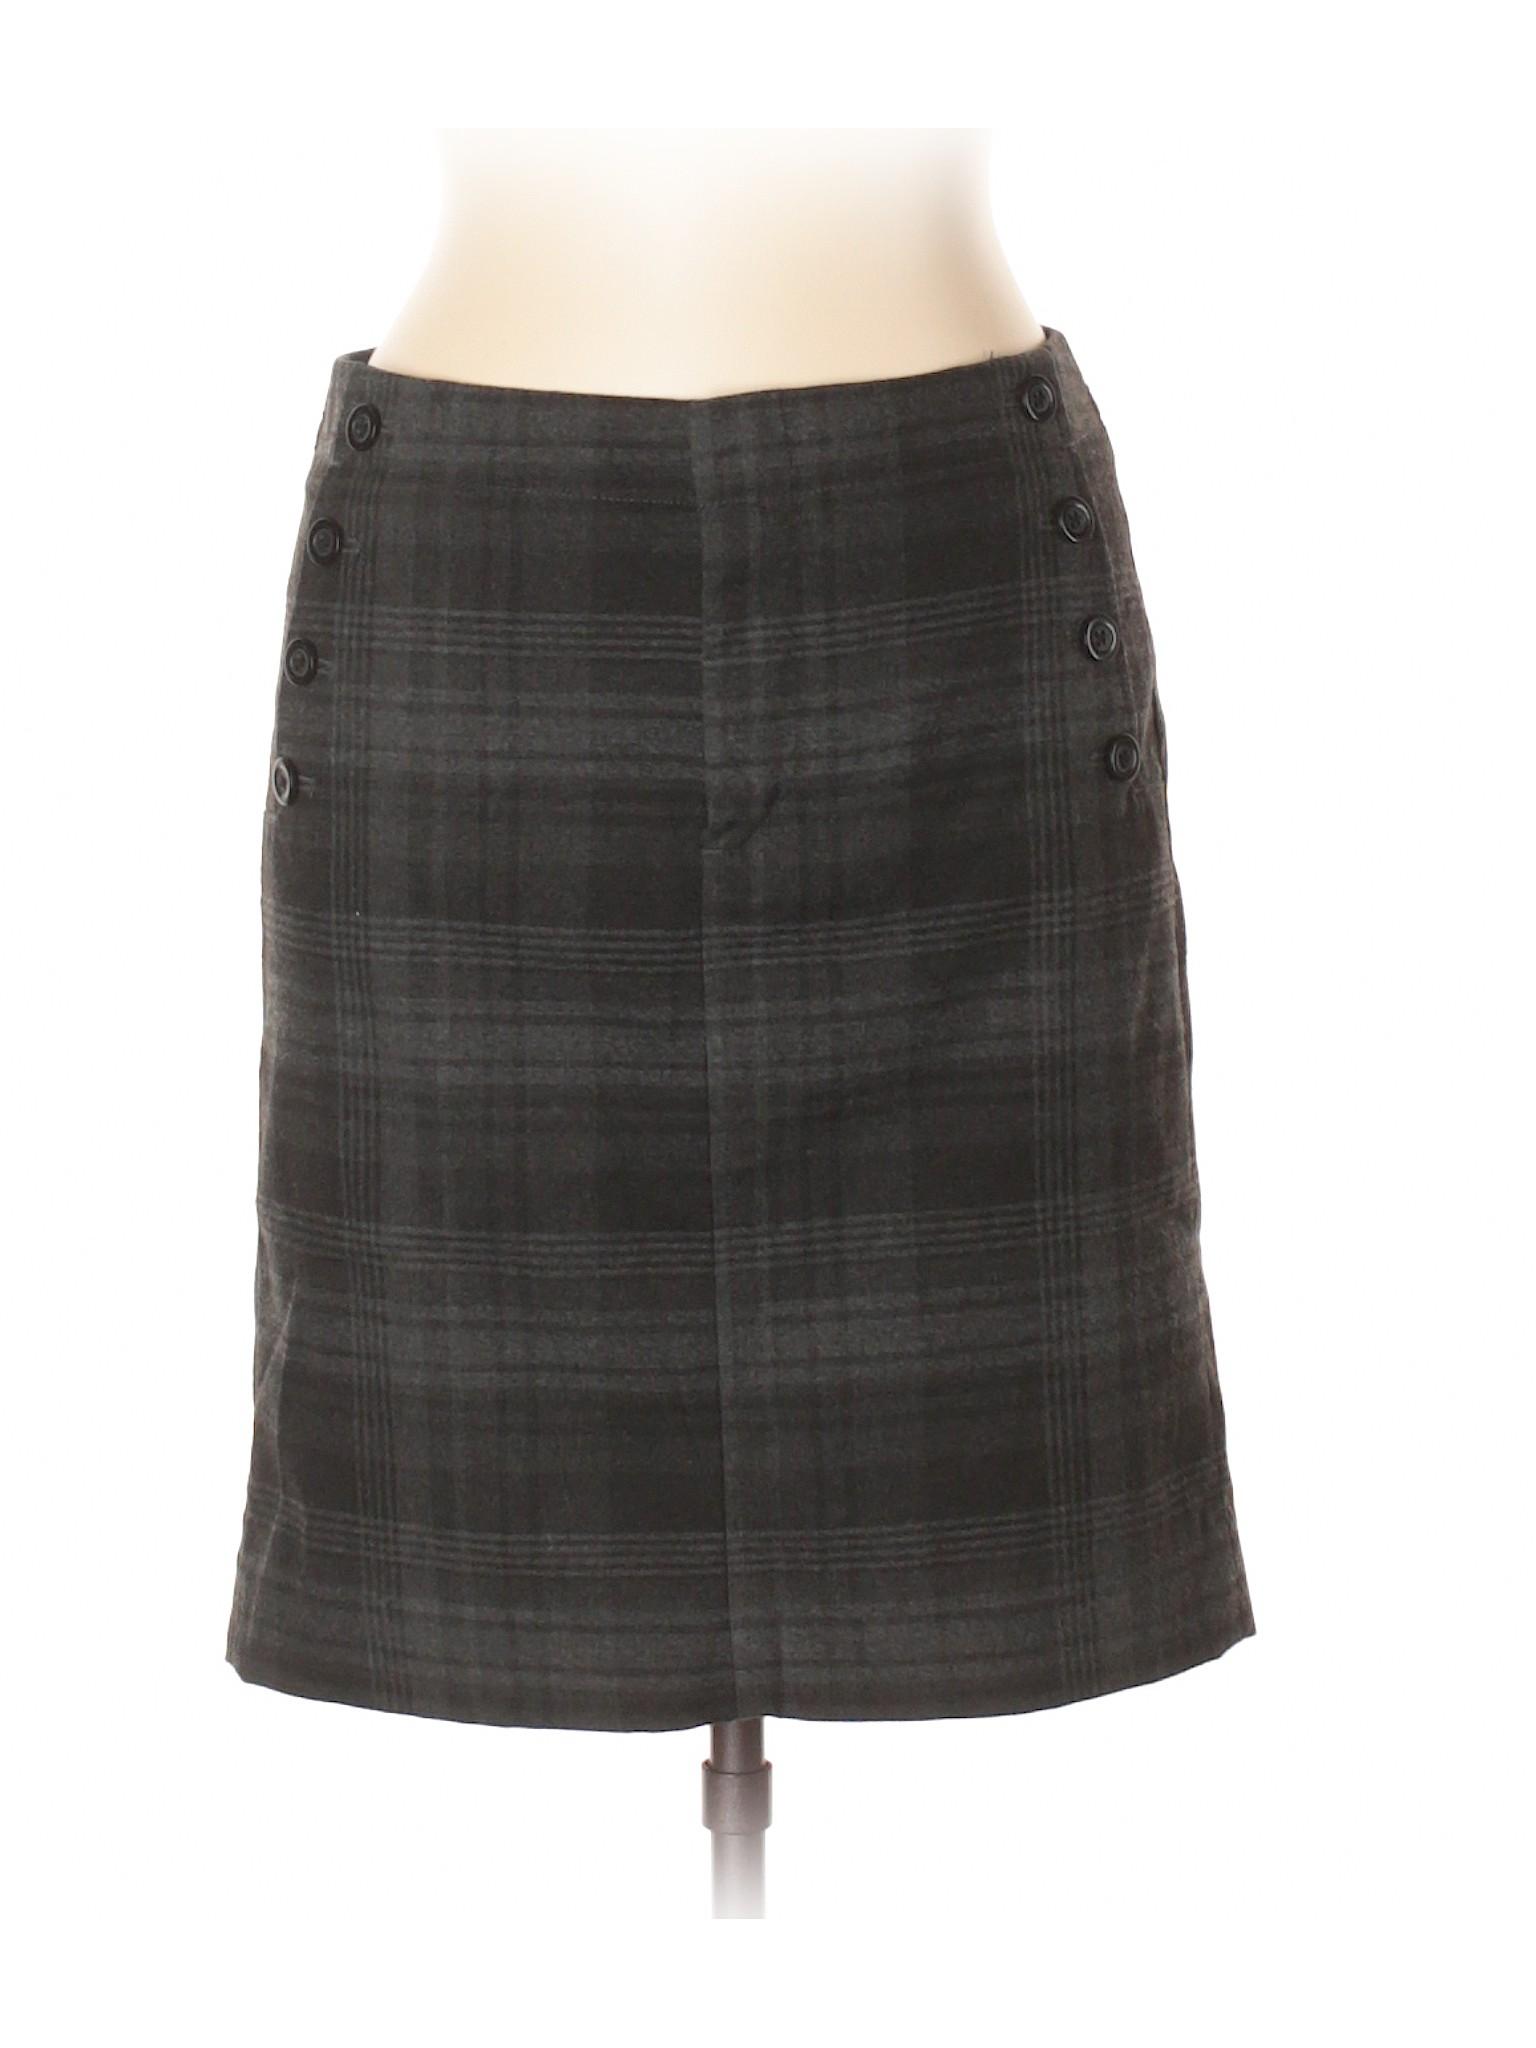 winter Leisure Leisure Skirt Gap Casual Skirt Casual Gap winter fgqxx6zw